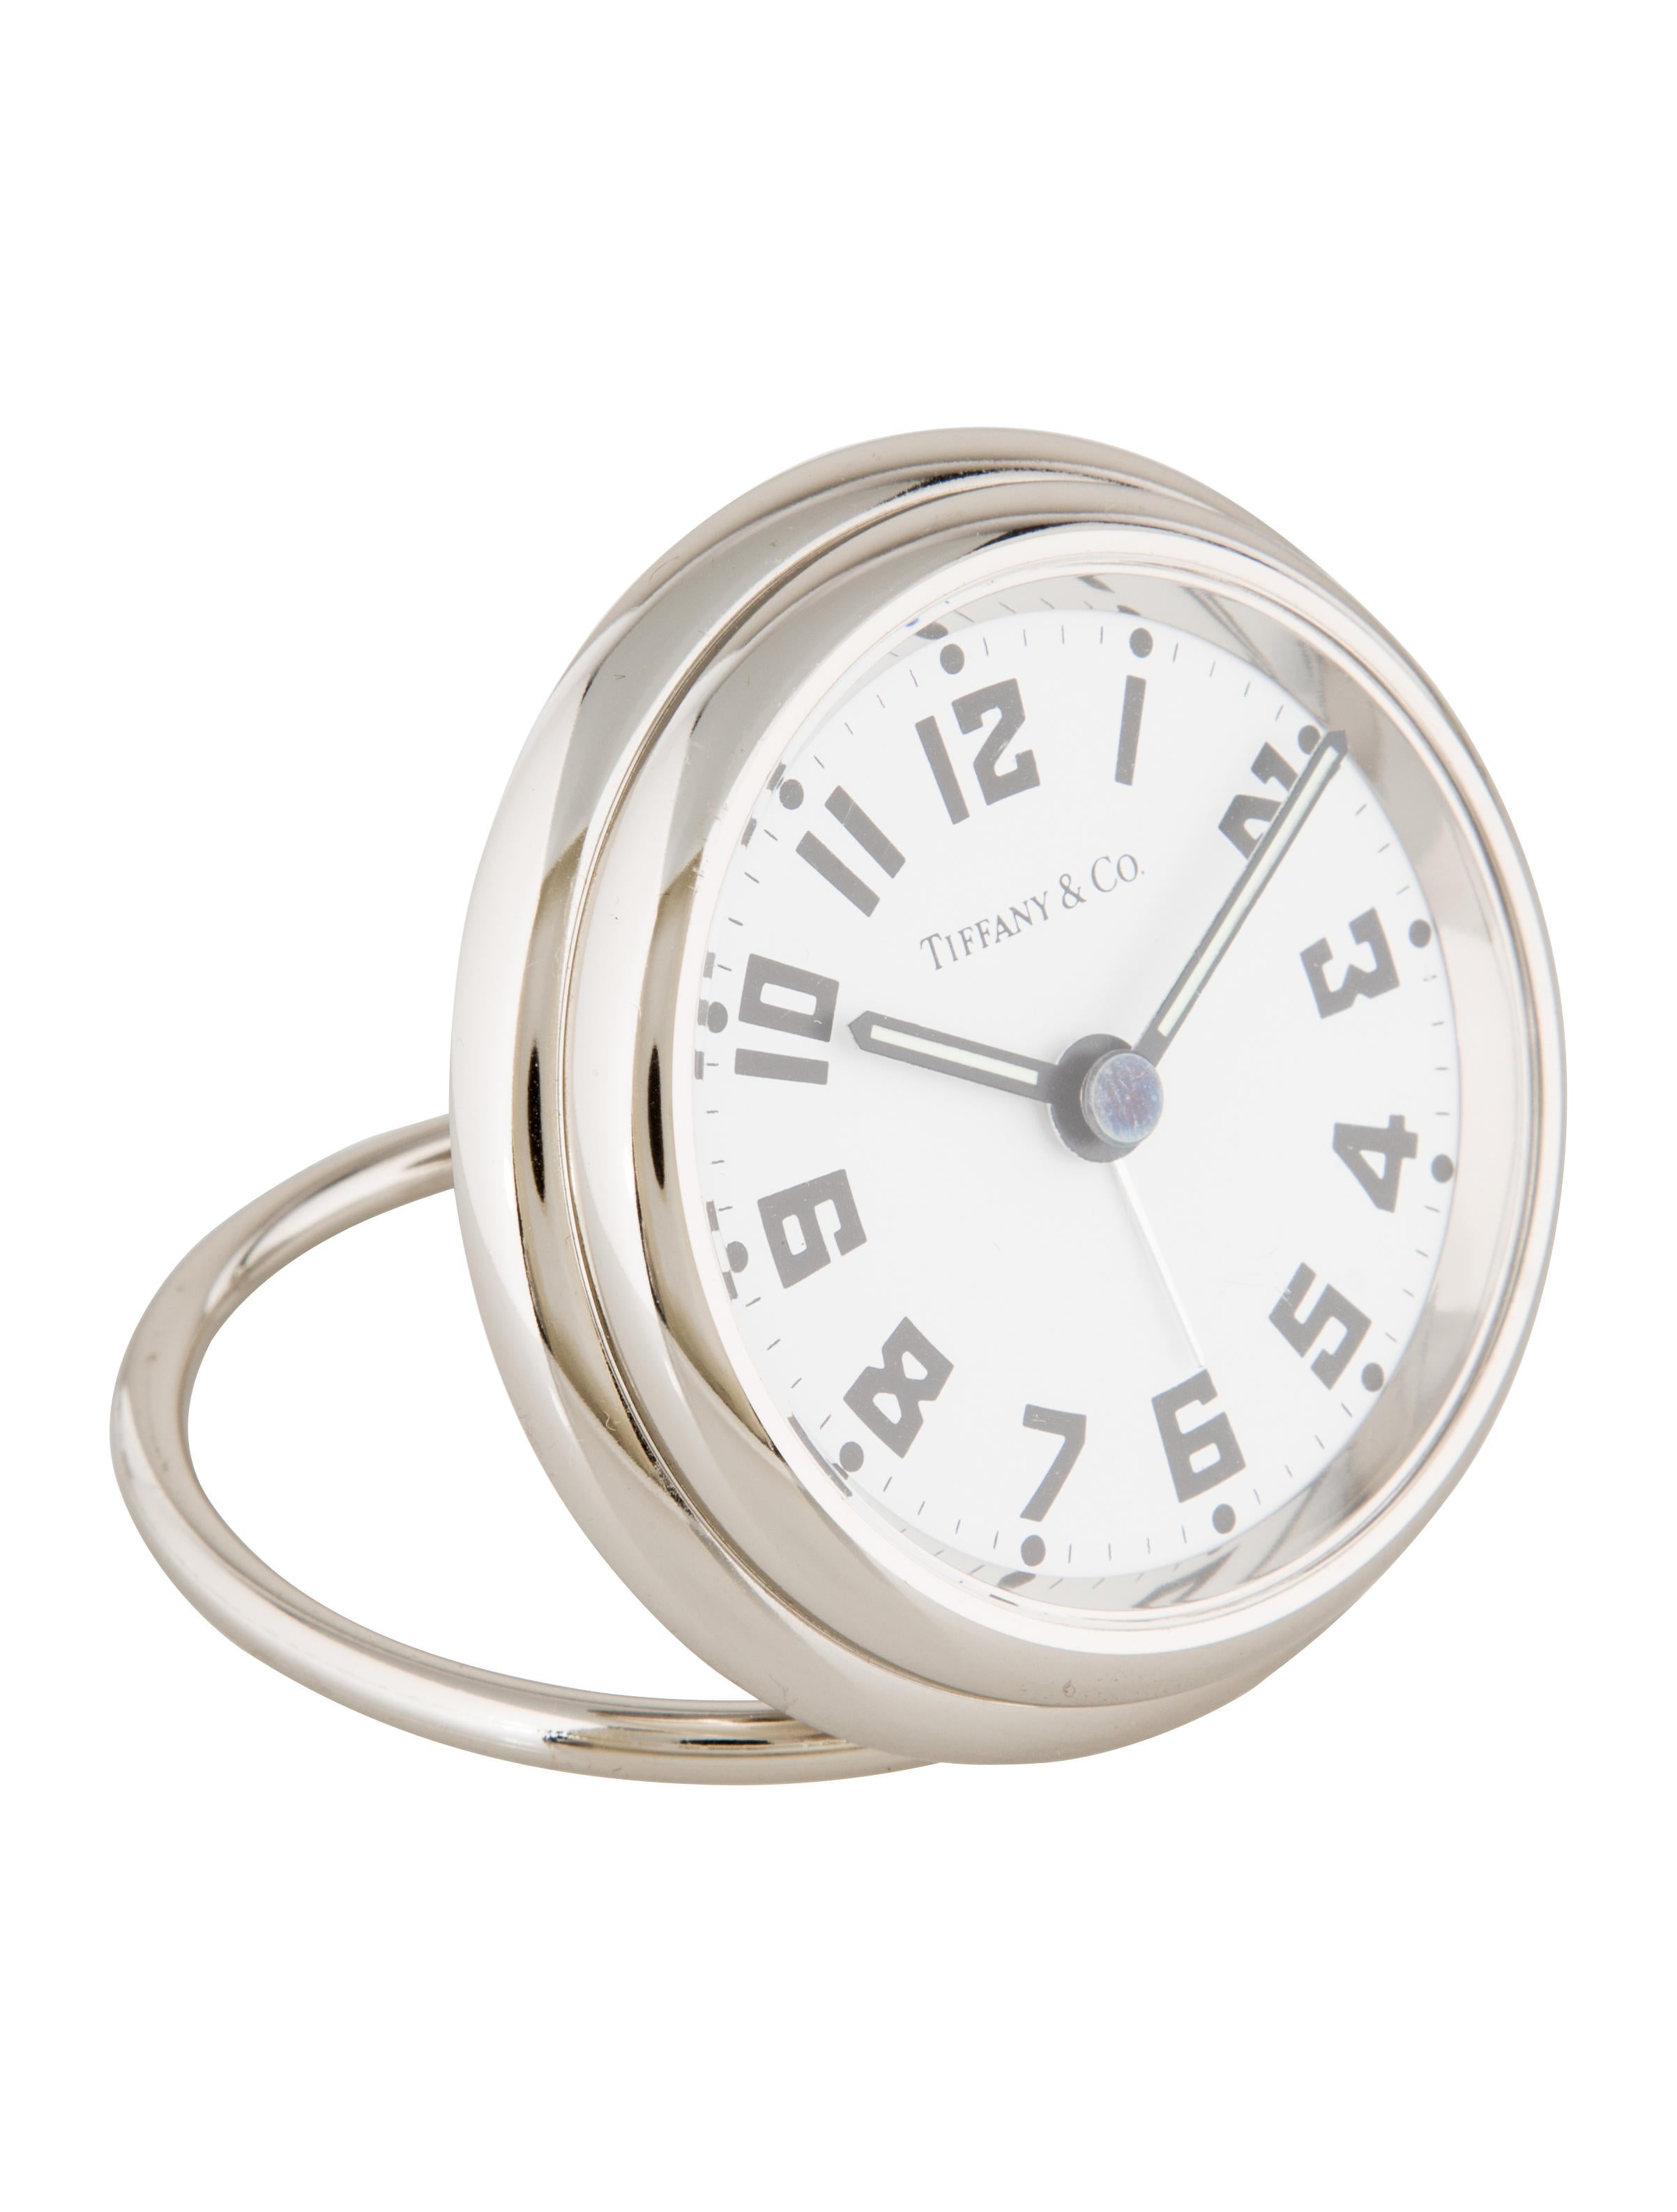 Tiffany co travel clock decor and accessories for Artistic accents genuine silver decoration